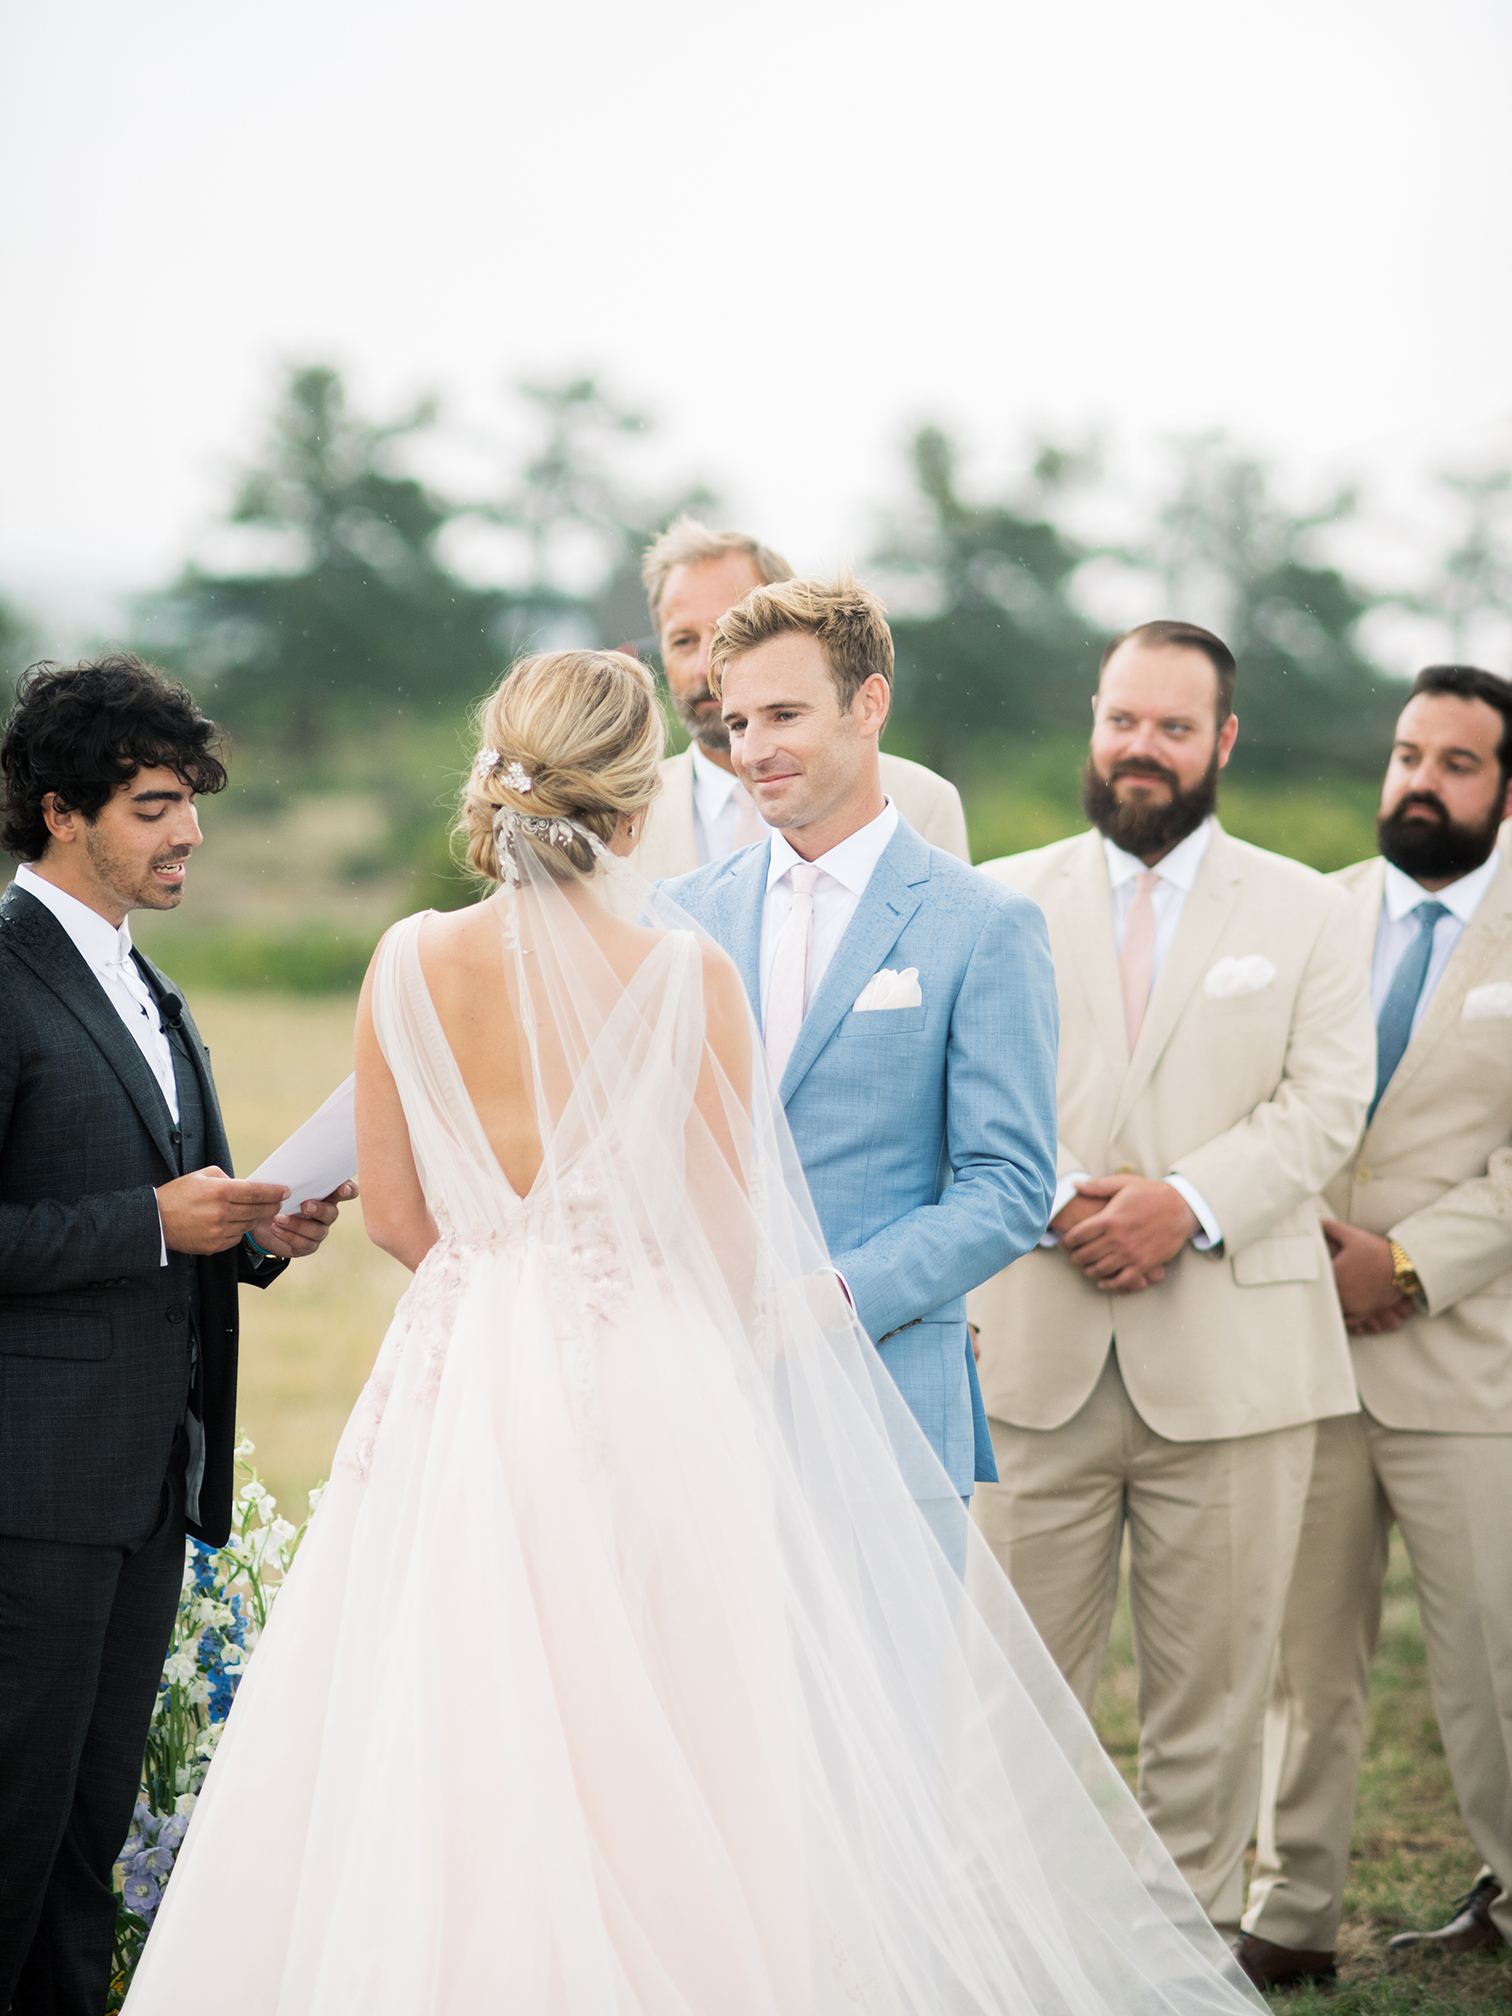 Colorado Wedding Photographers, Groom Vows, Destination Weddings in Colorado, Denver Wedding Photos